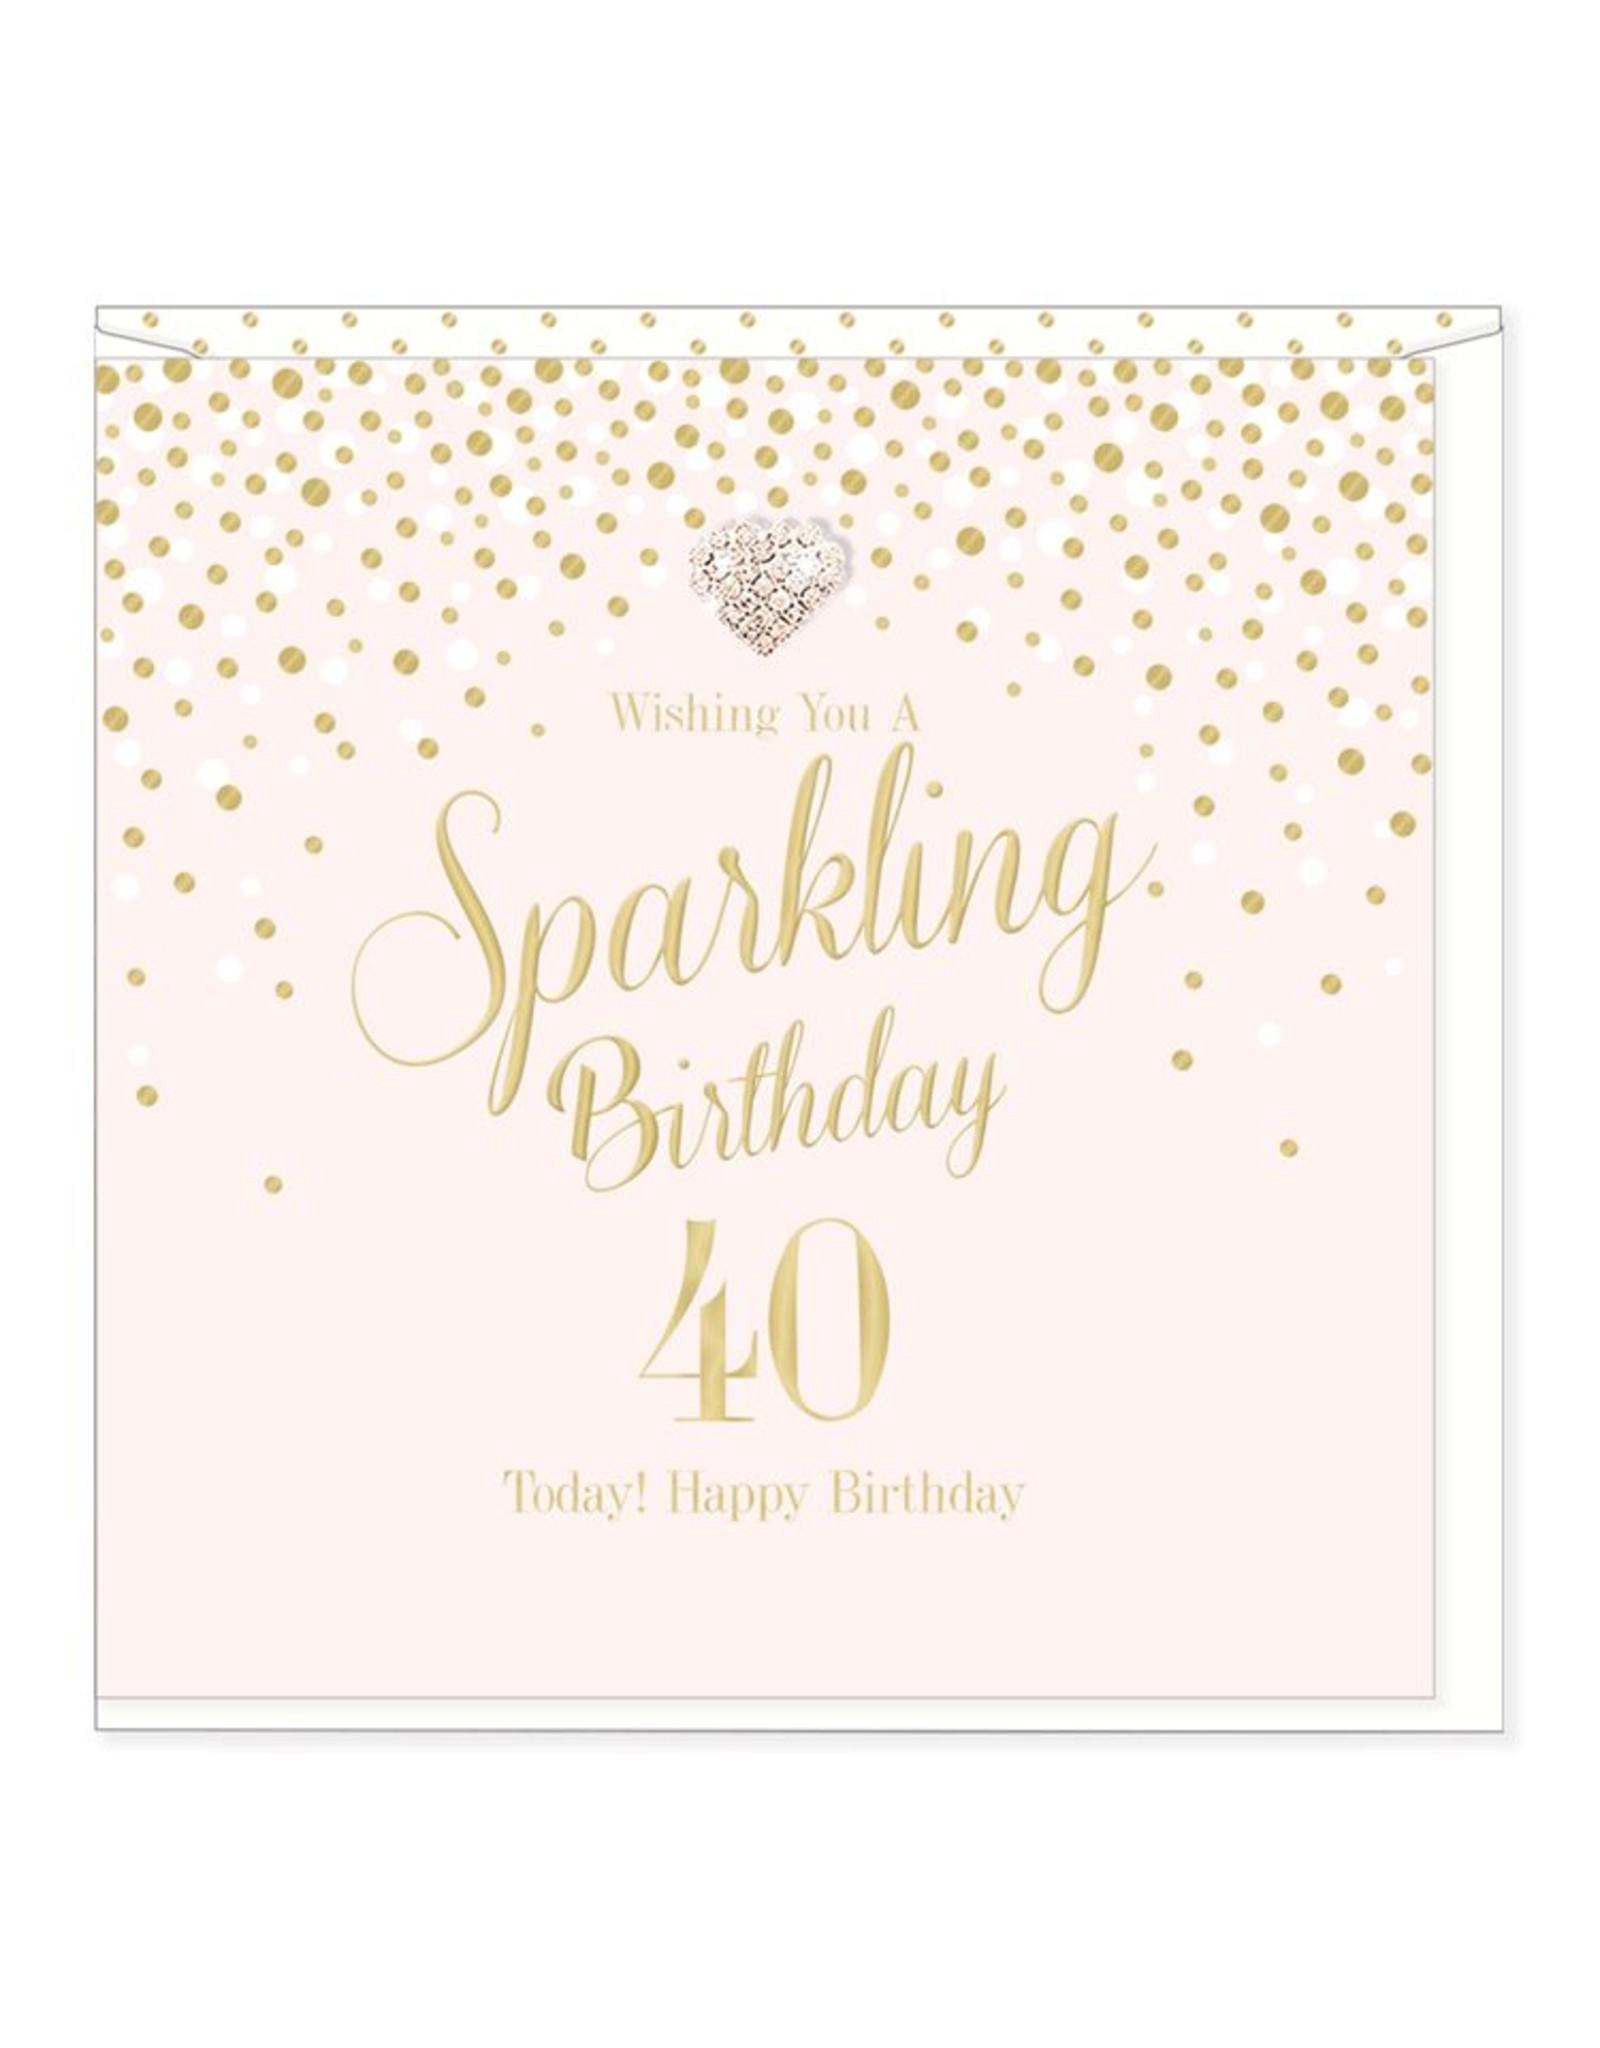 Hearts Design Sparkling Birthday - 40